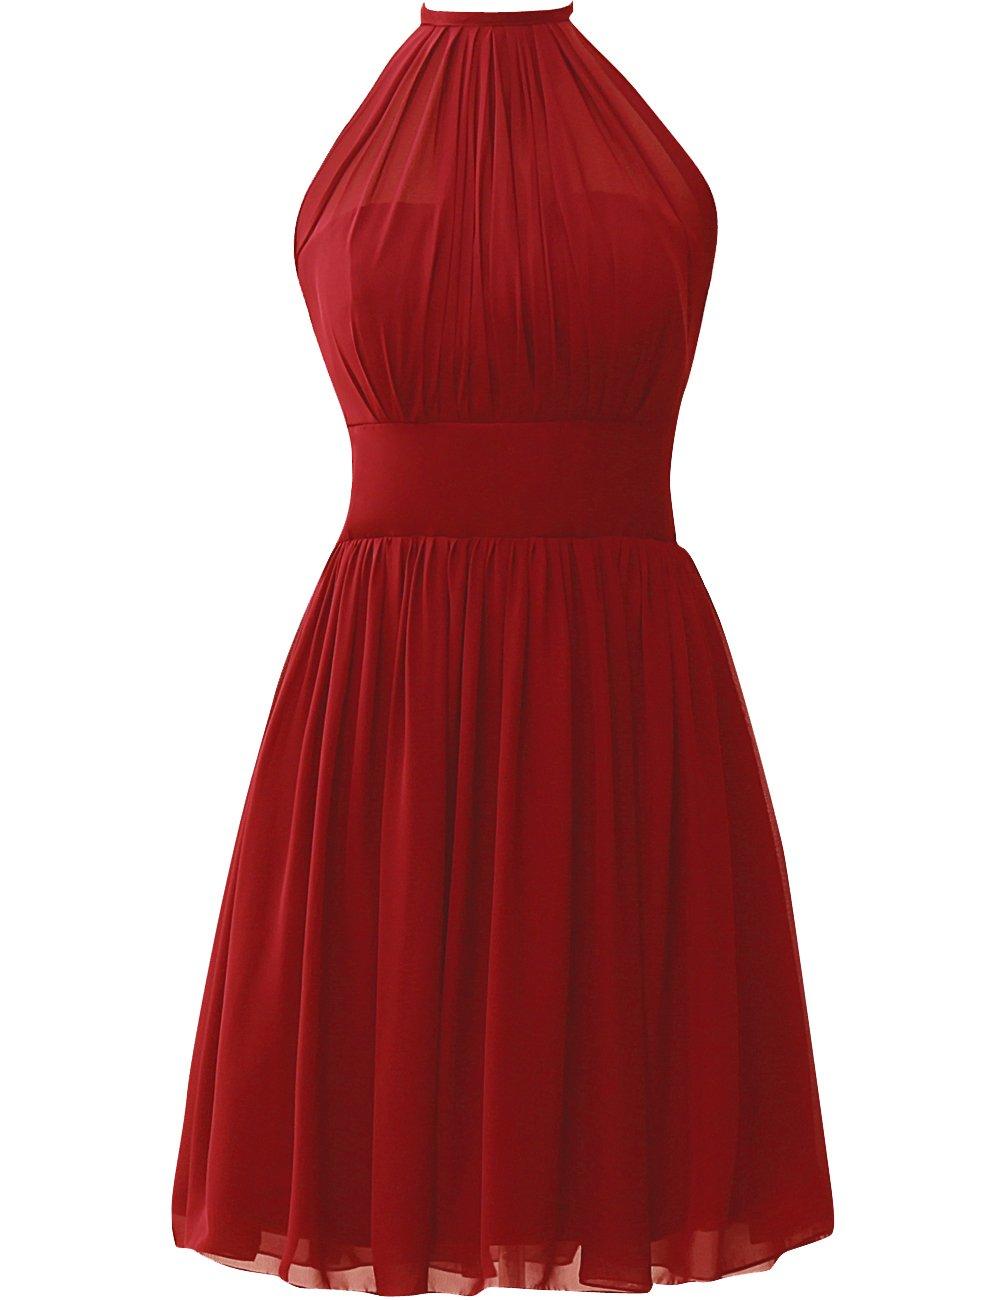 JAEDEN Bridesmaid Dress Short Homecoming Dresses Chiffon Prom Dress Halter Gown Red 5X